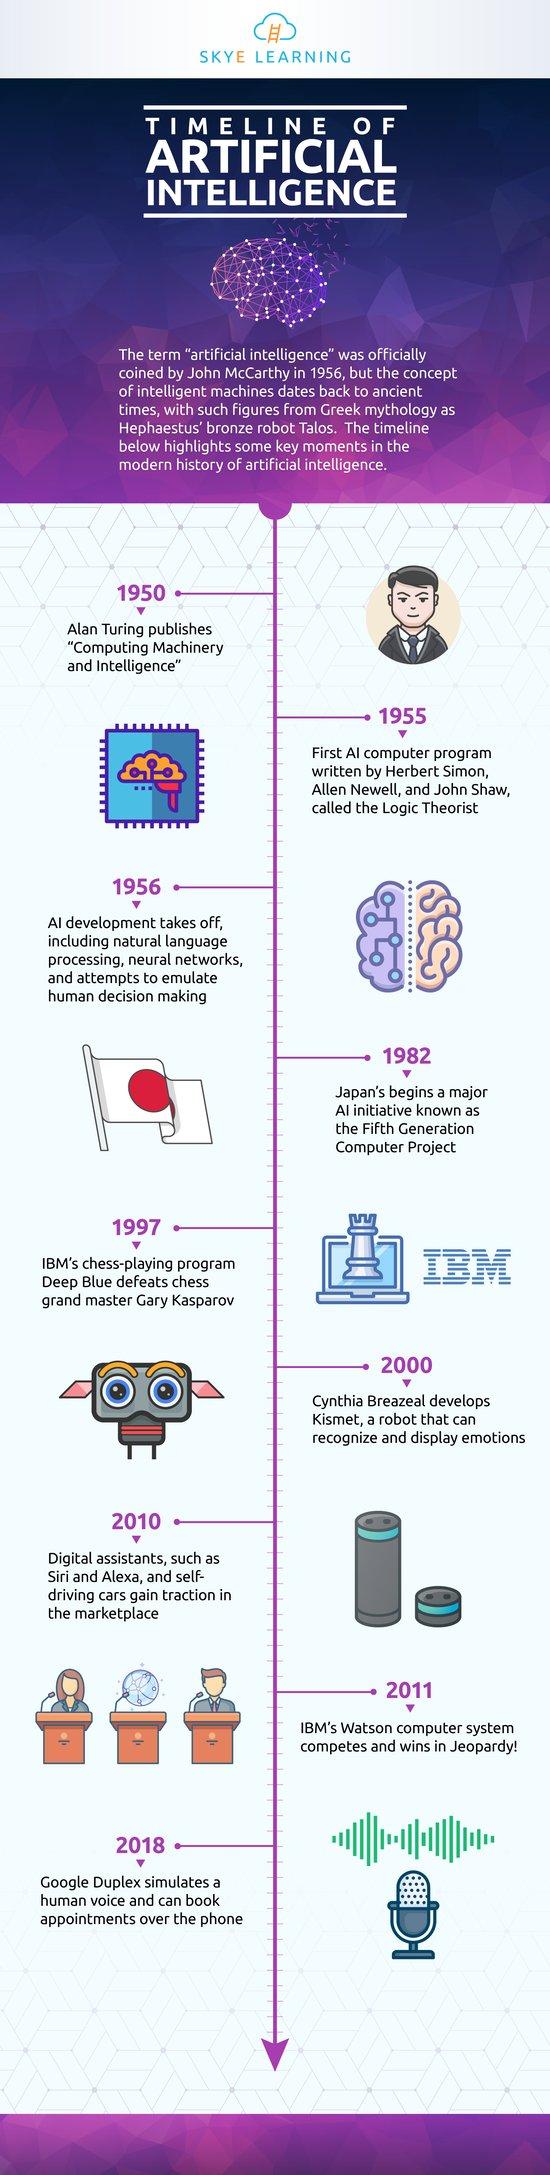 Timeline-of-Artificial-Intelligence-SL